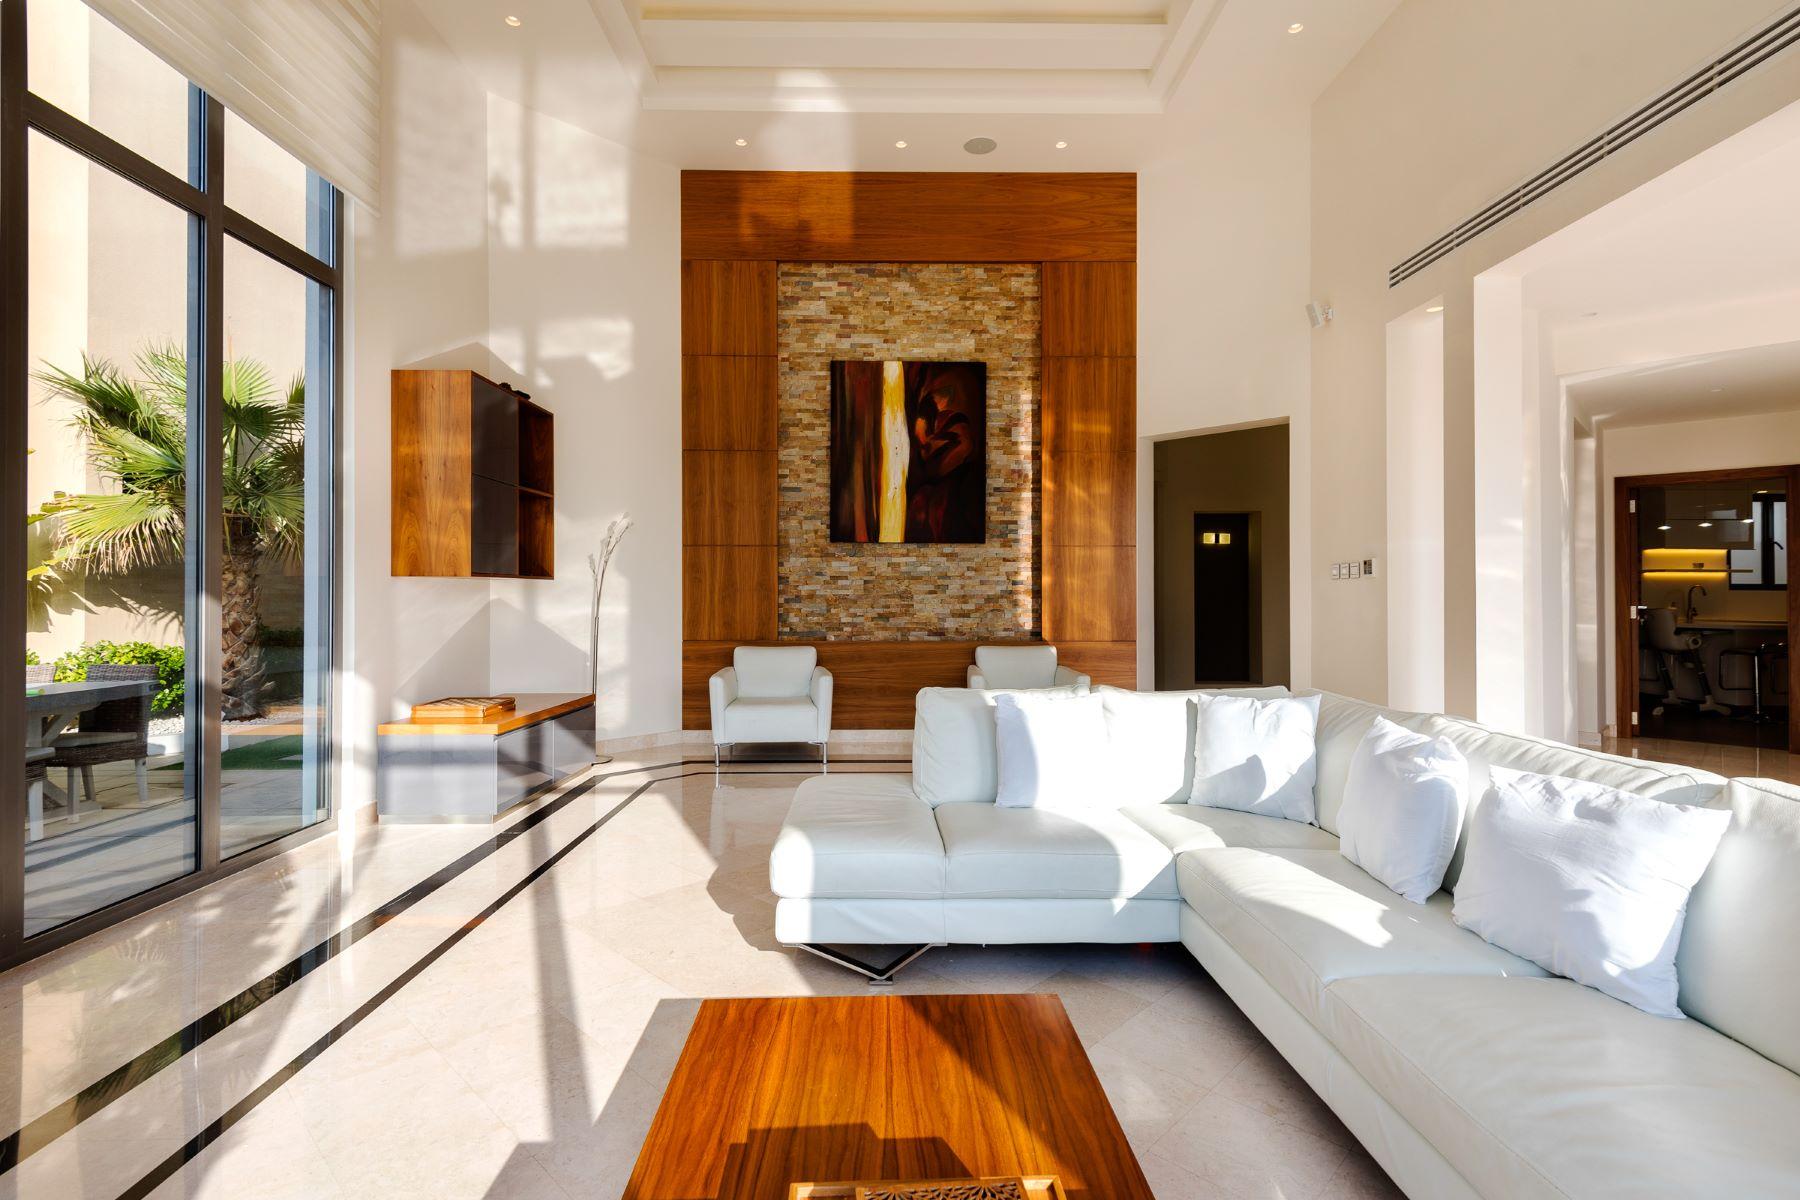 Single Family Home for Sale at 4 Bed Beach Front Villa Dubai, Dubai United Arab Emirates